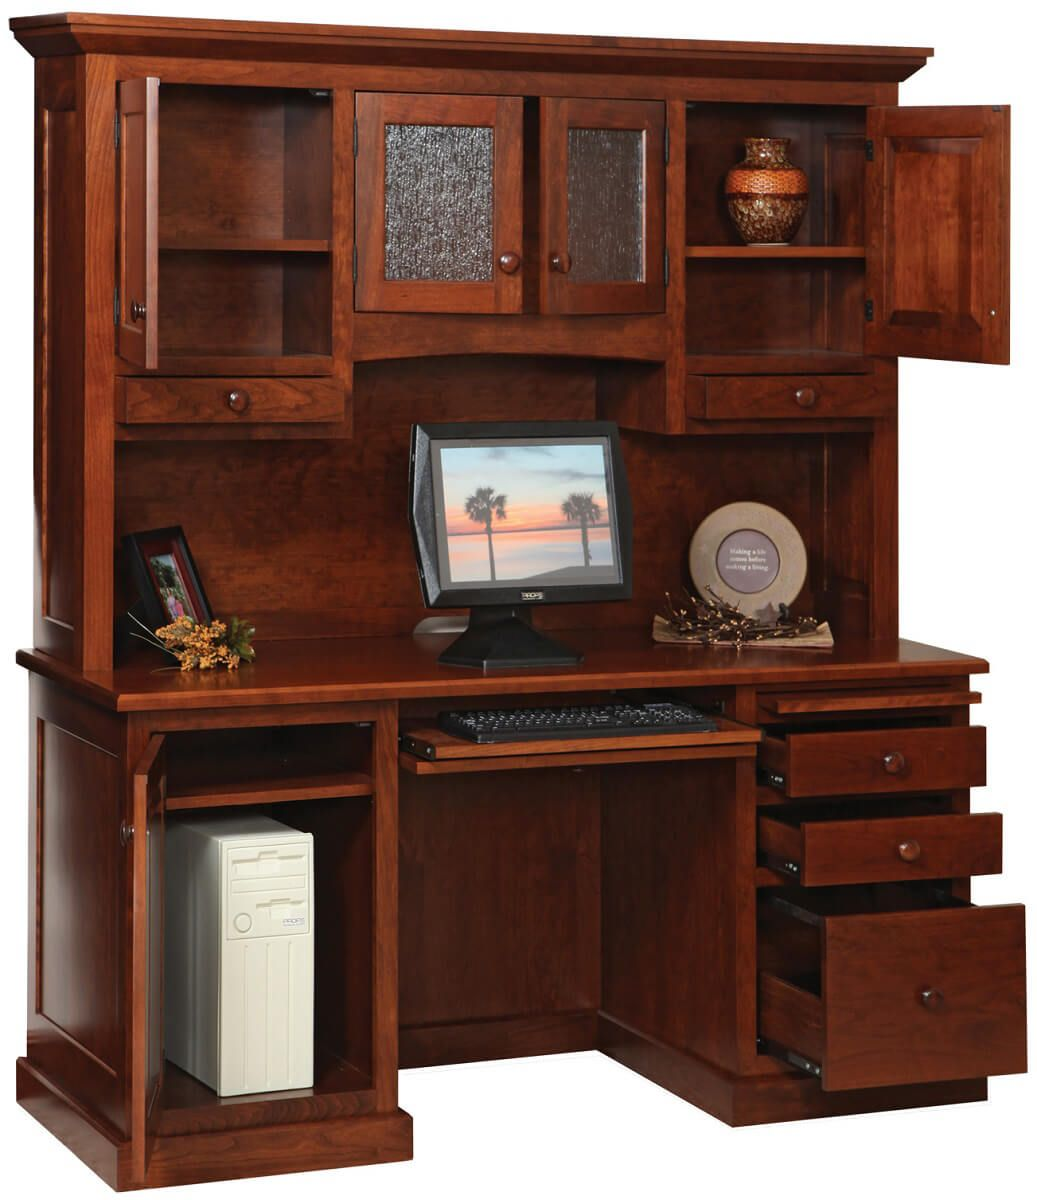 Handmade Wooden Computer Desk